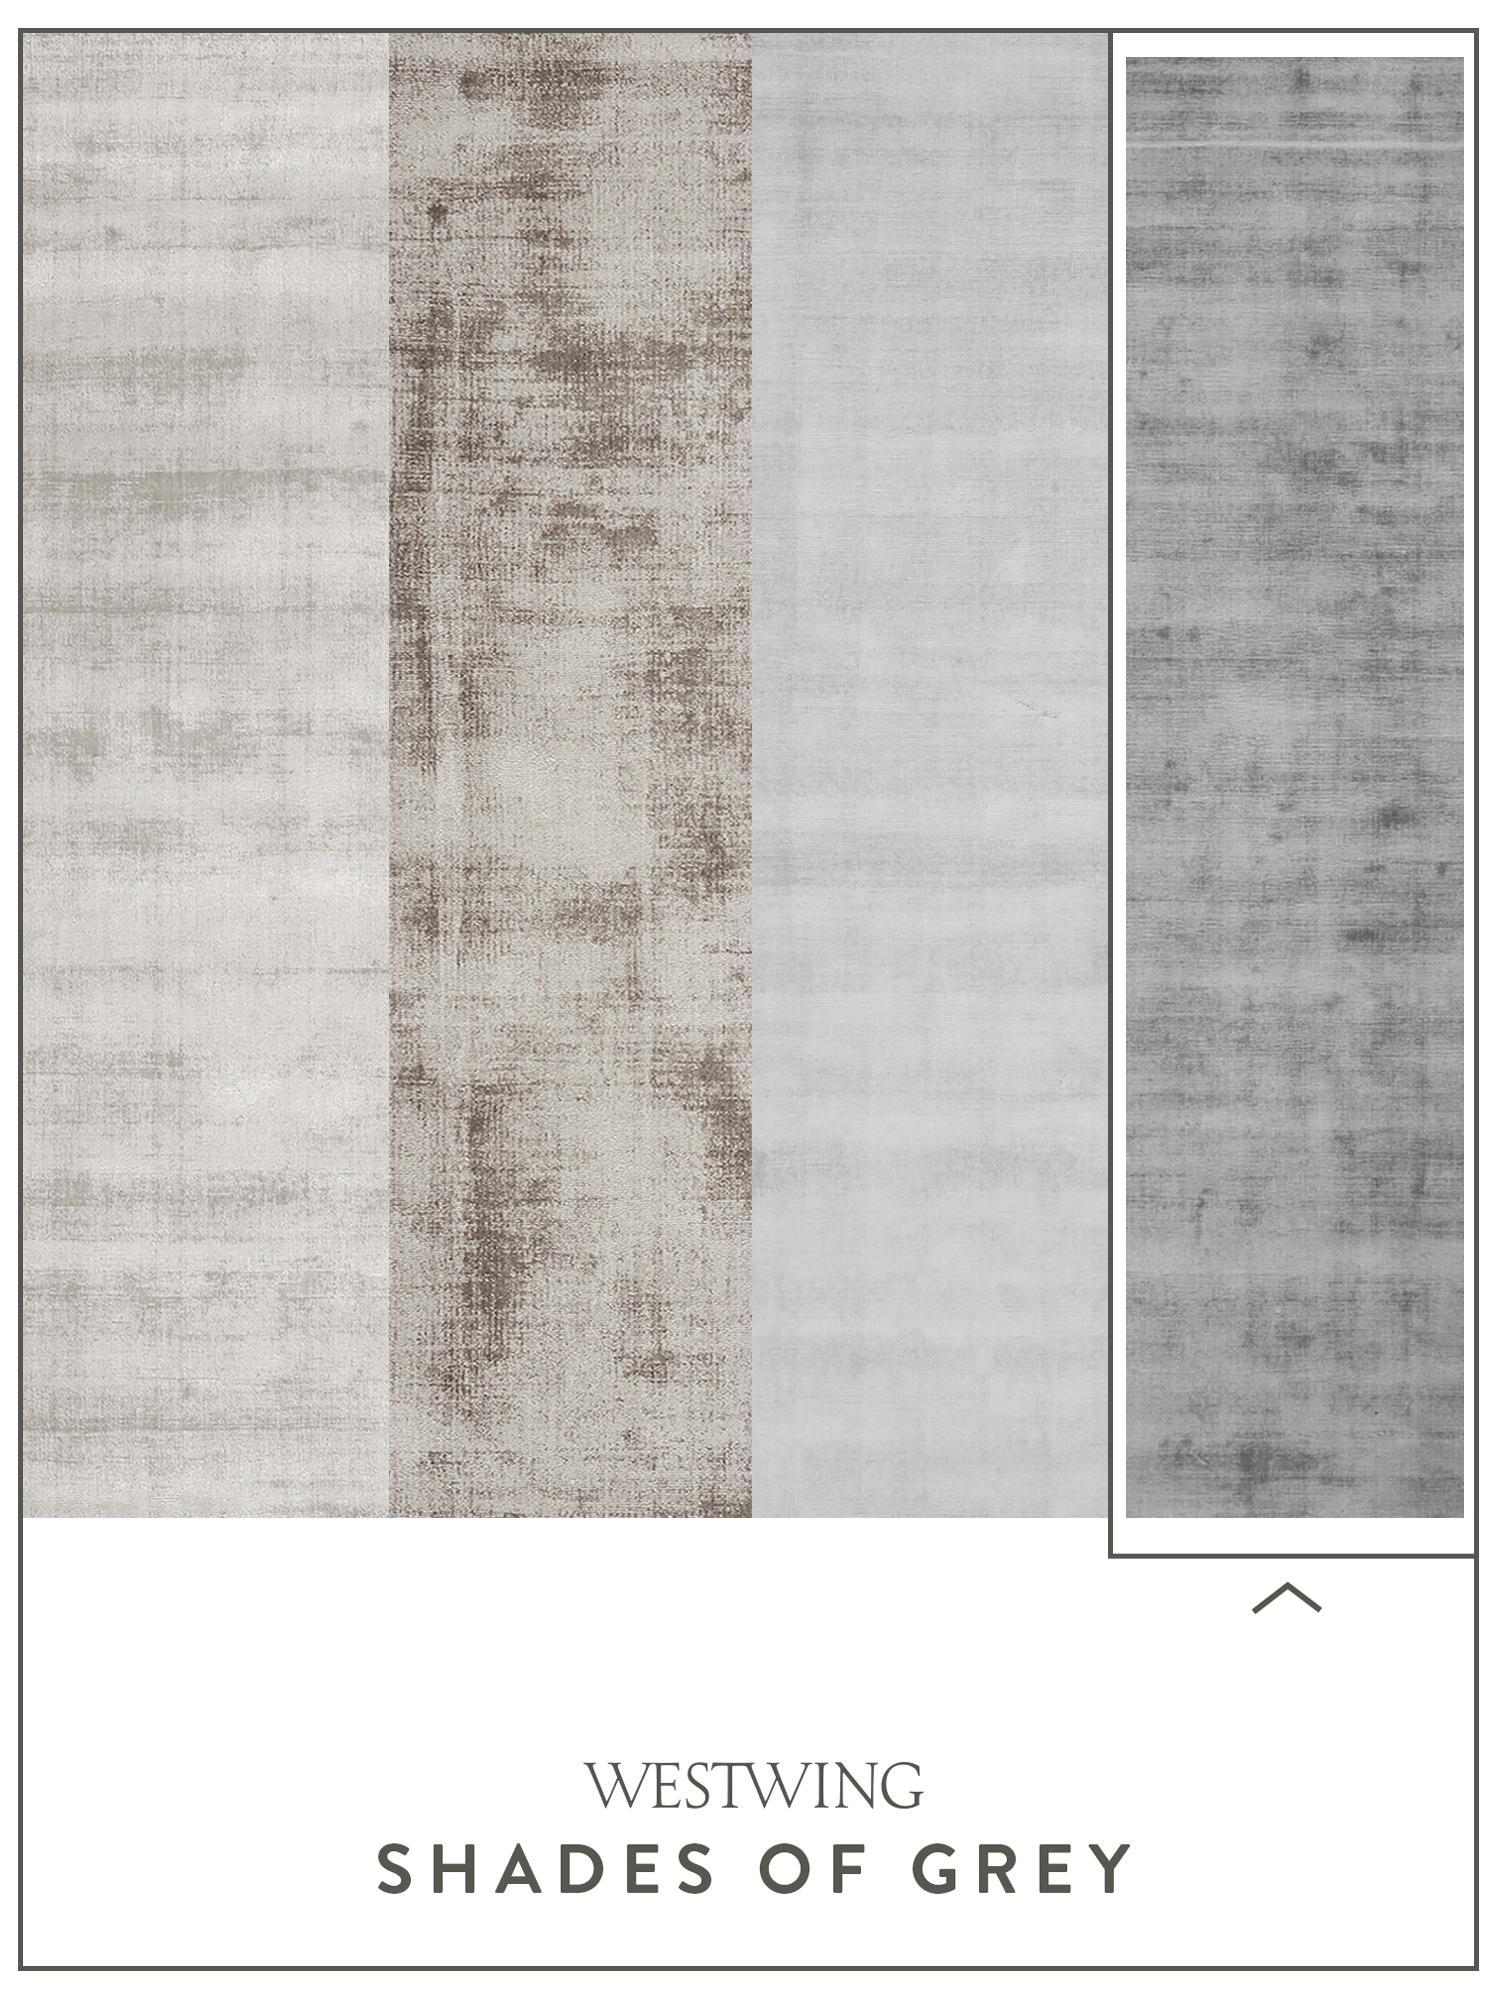 Handgewebter Viskoseteppich Jane in Grau, Flor: 100% Viskose, Grau, B 300 x L 400 cm (Grösse XL)